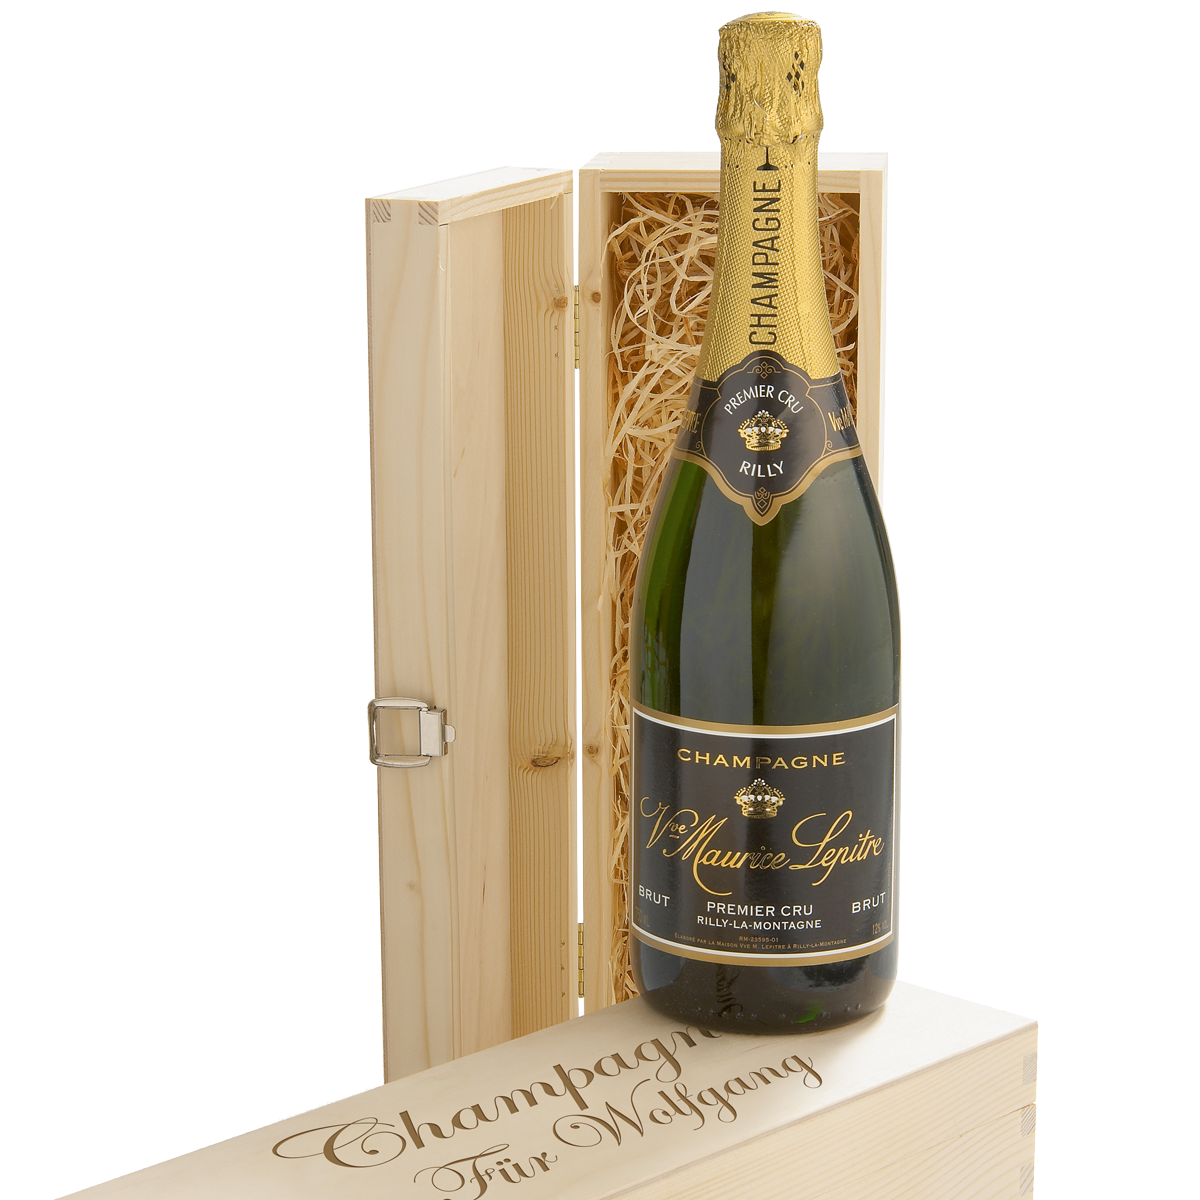 Champagne Lepitre Premier Cru